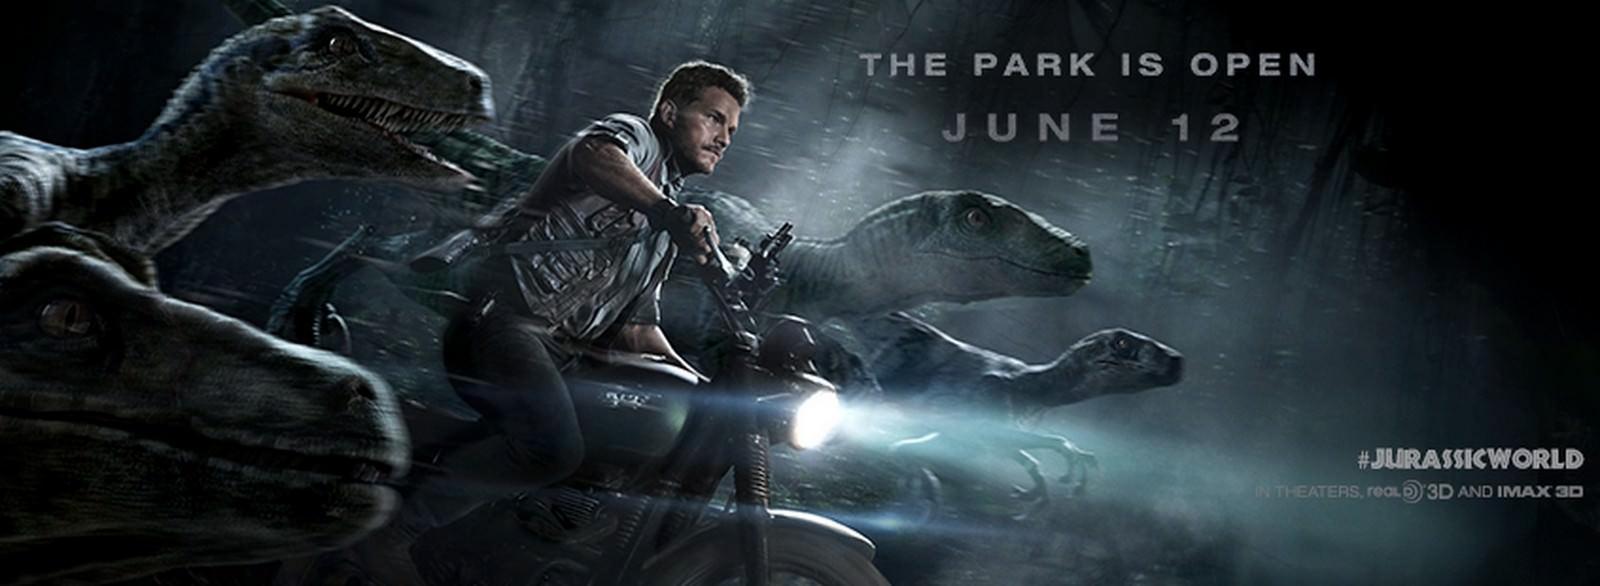 Movie, Jurassic World(美國, 2015) / 侏羅紀世界(台.港) / 侏罗纪世界(中), 電影海報, 美國, 橫版